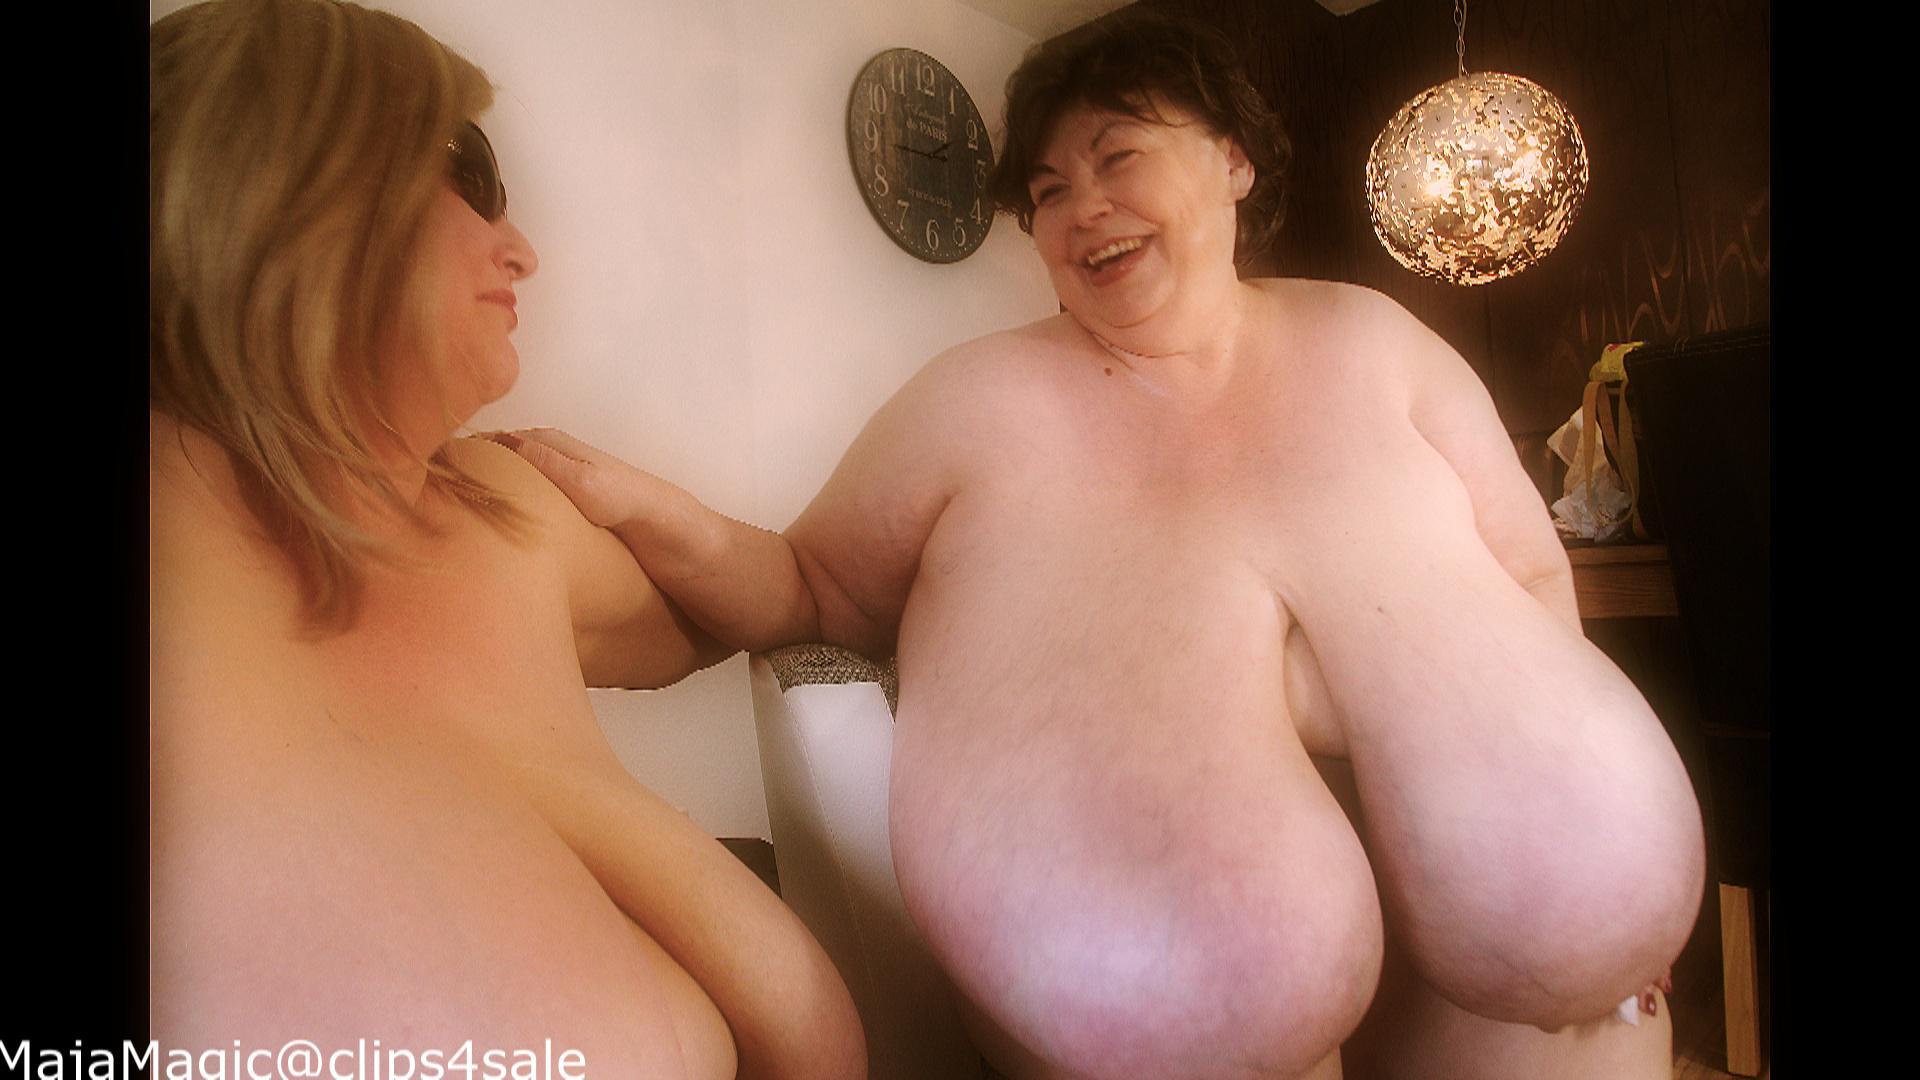 Aunt Mia - Free Porn Pics and Sex Galleries